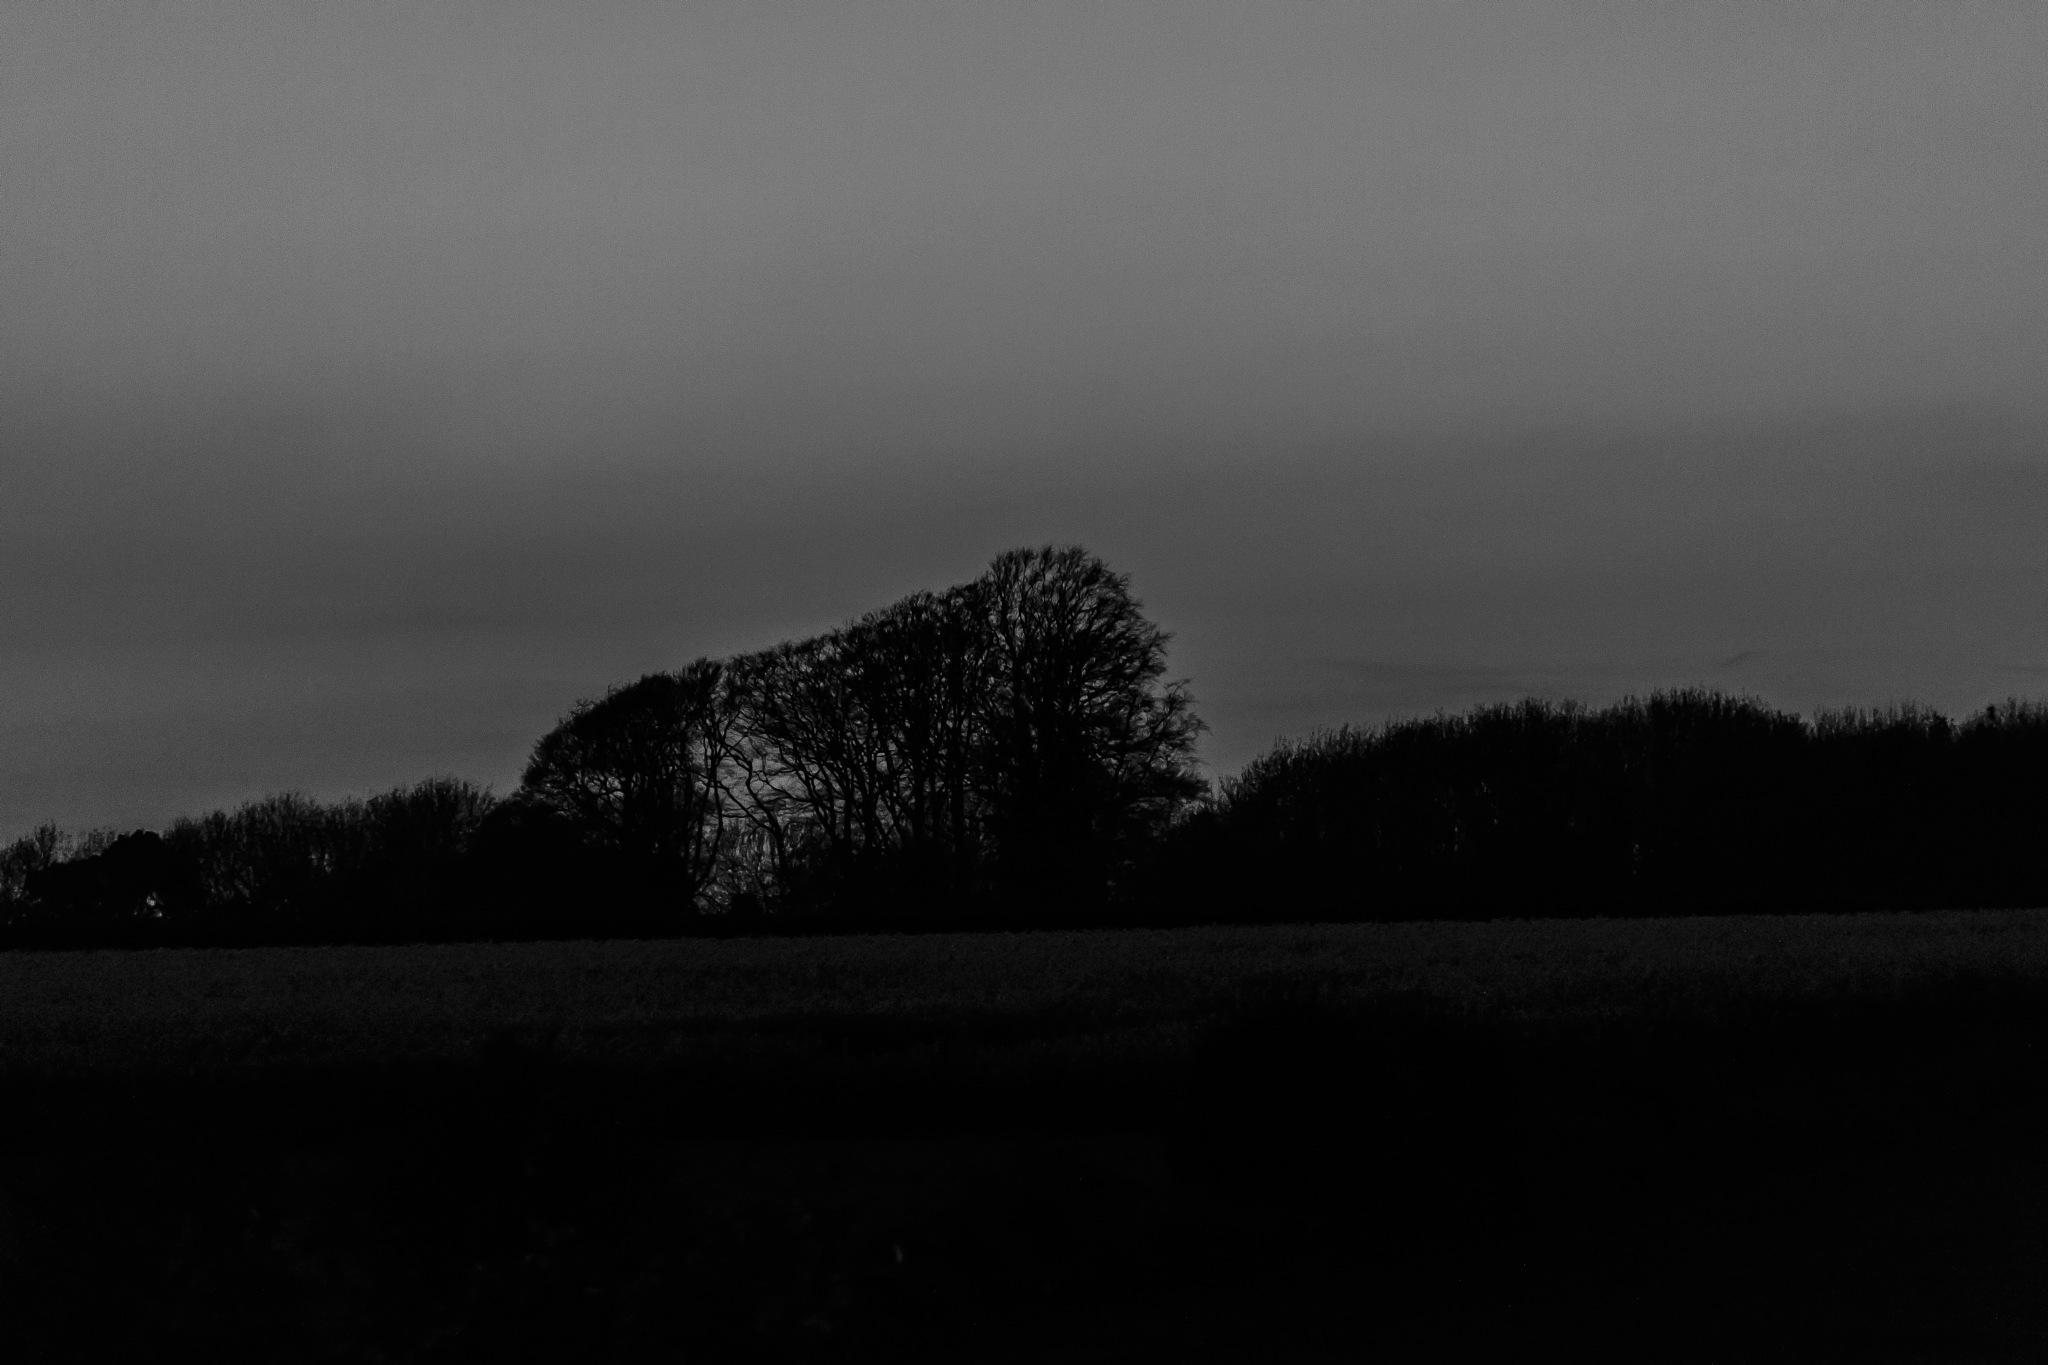 Night Sky 1 by Martyn